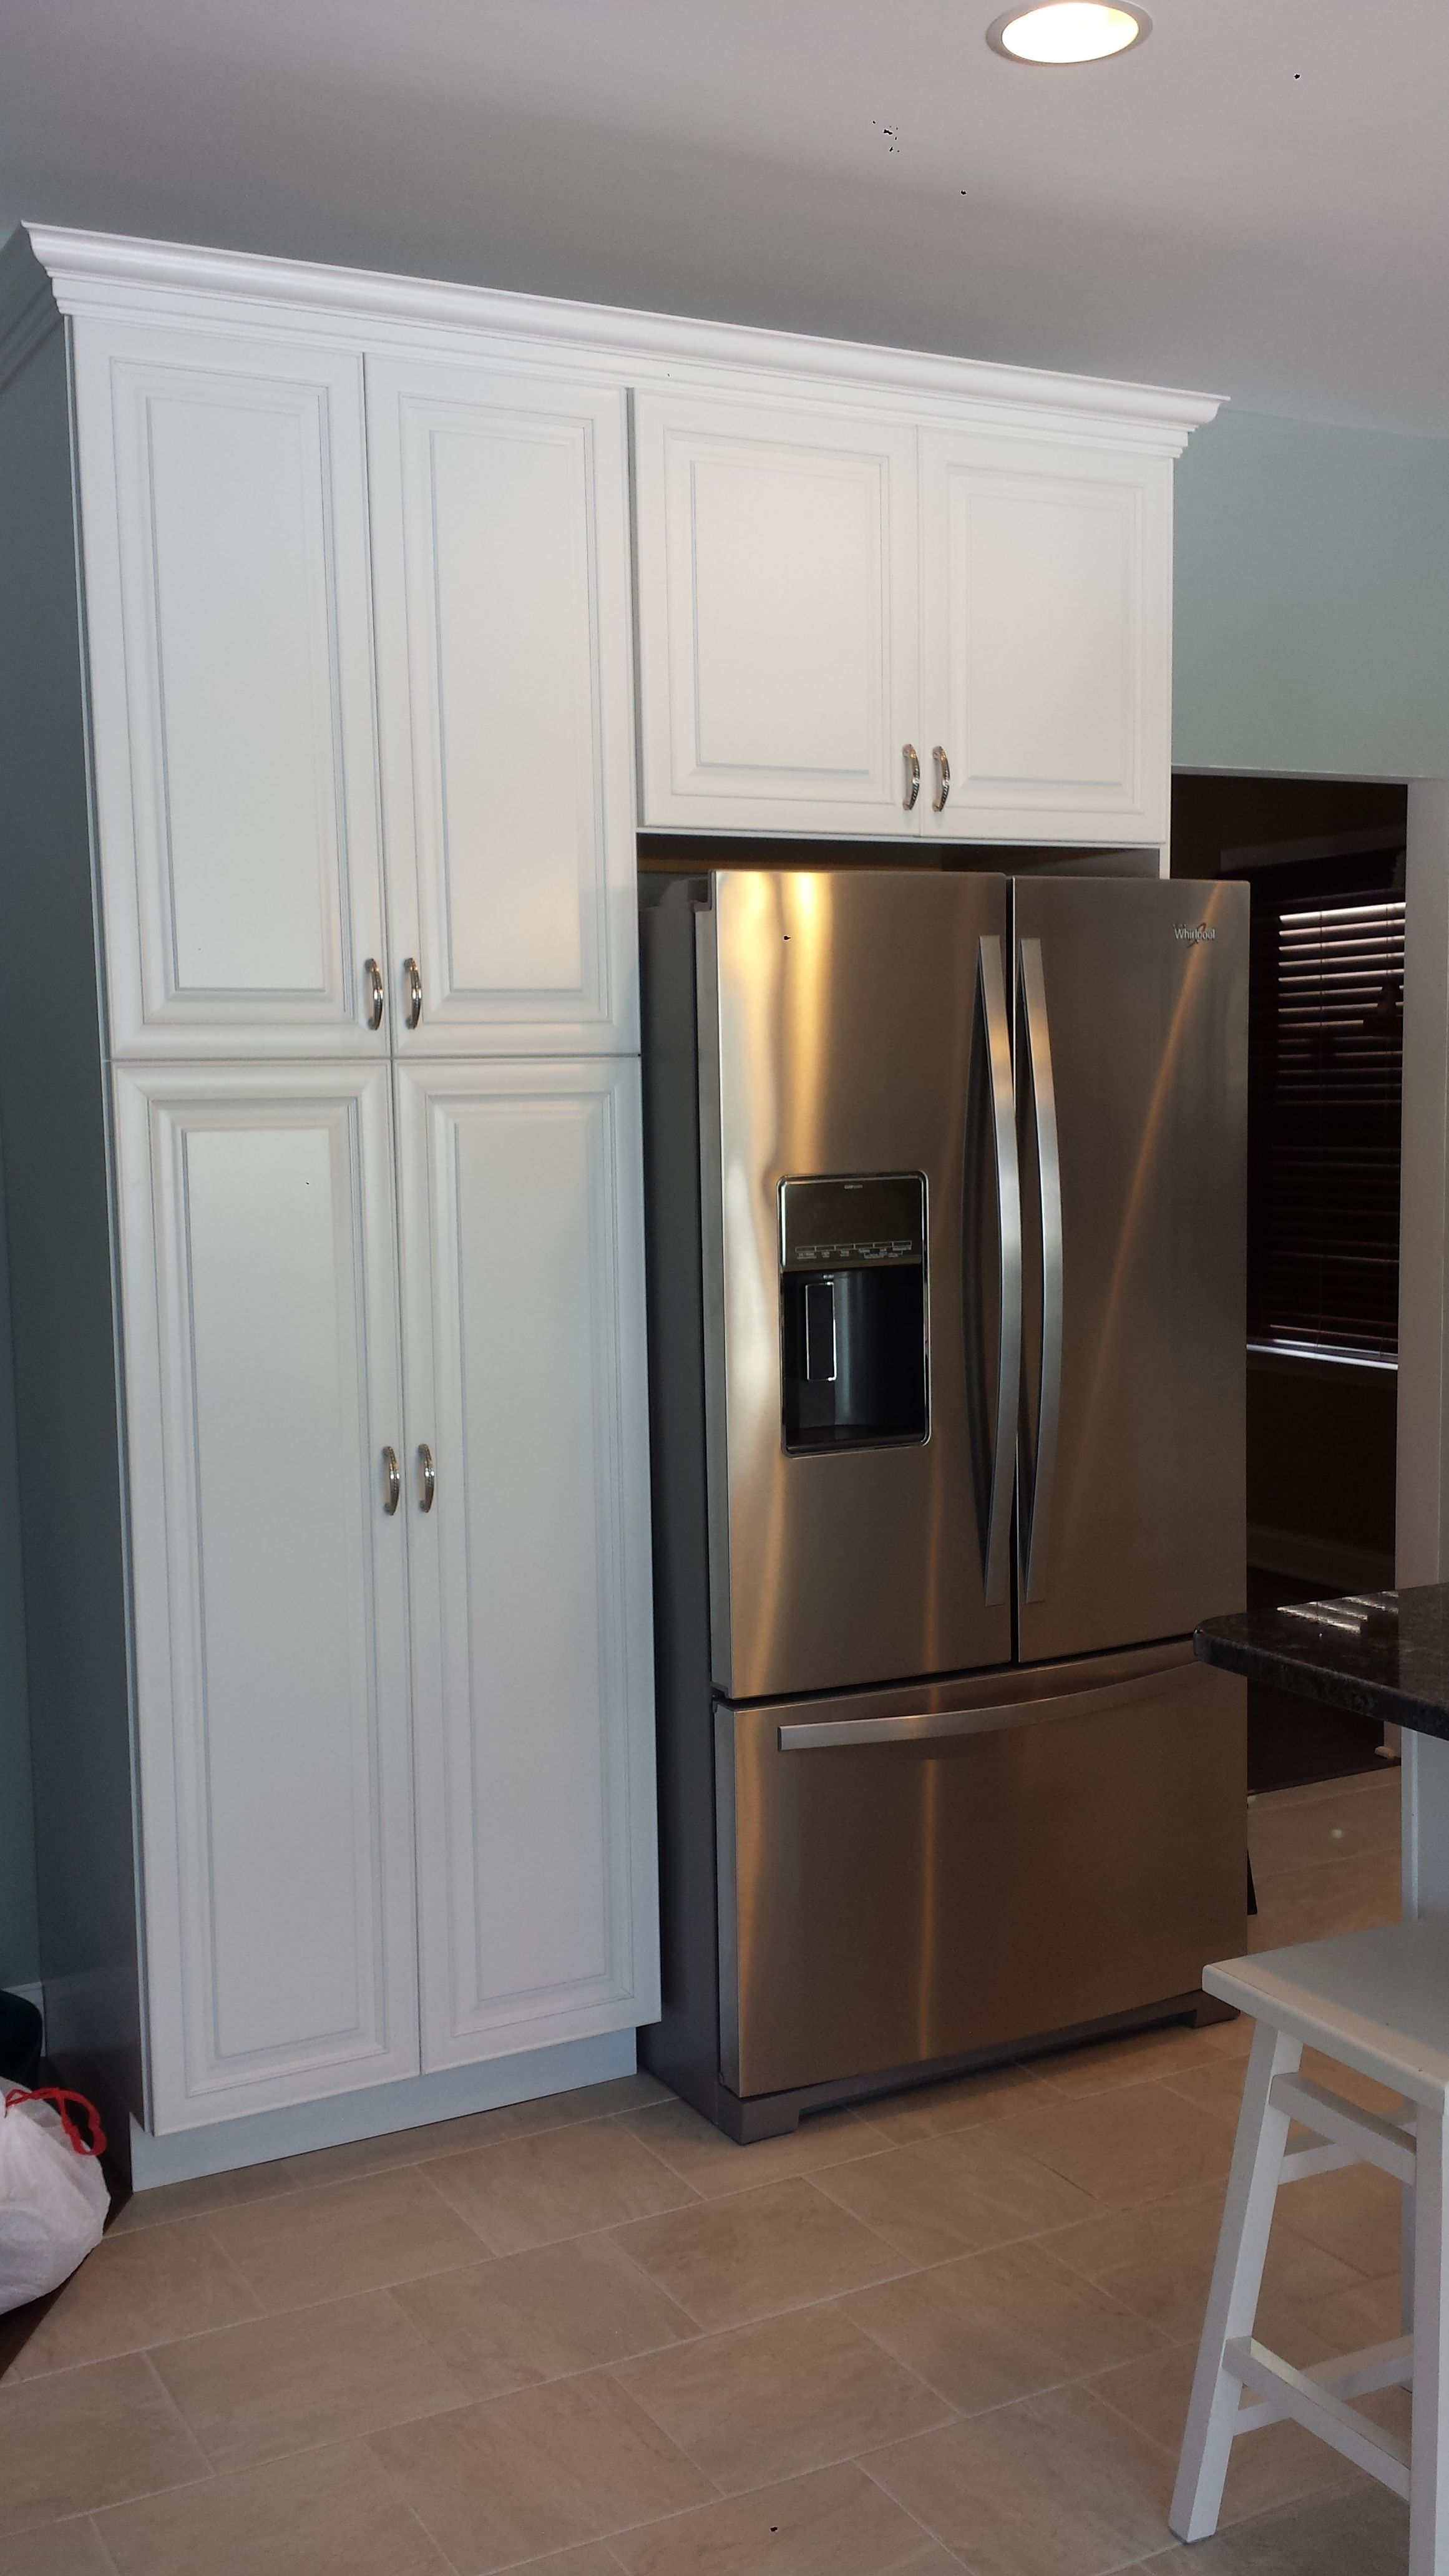 Beautiful Streater Kitchen Designed By Thomas Matteo #kitchen #kraftmaid #cabinets  #refrigerator #pantry